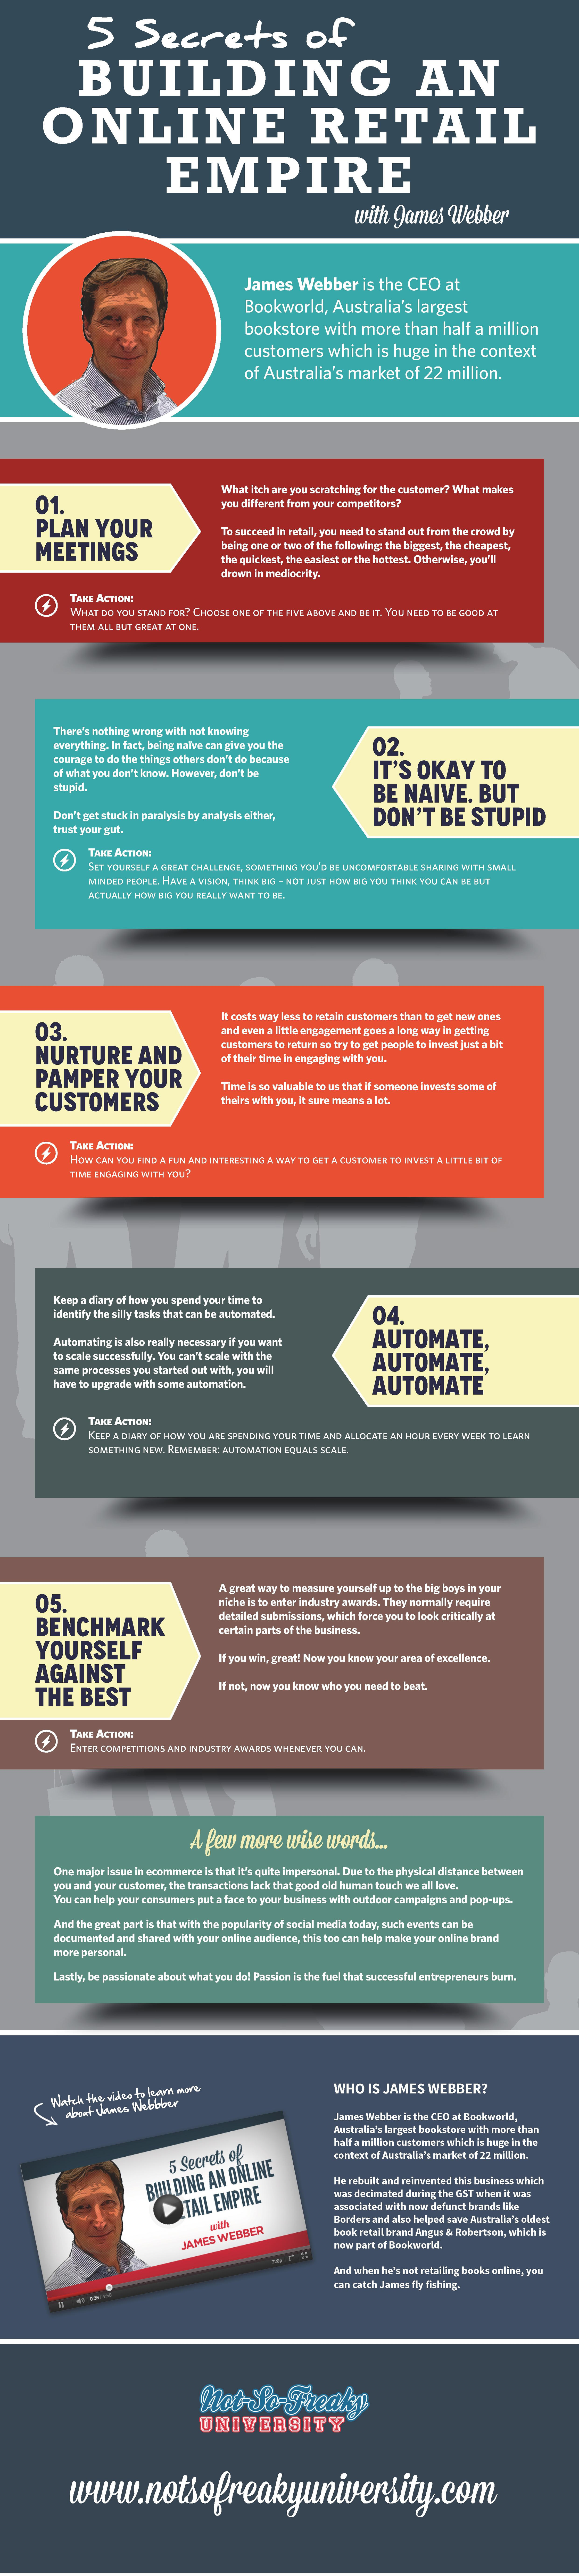 james webber infographic online retail - NSFU 01